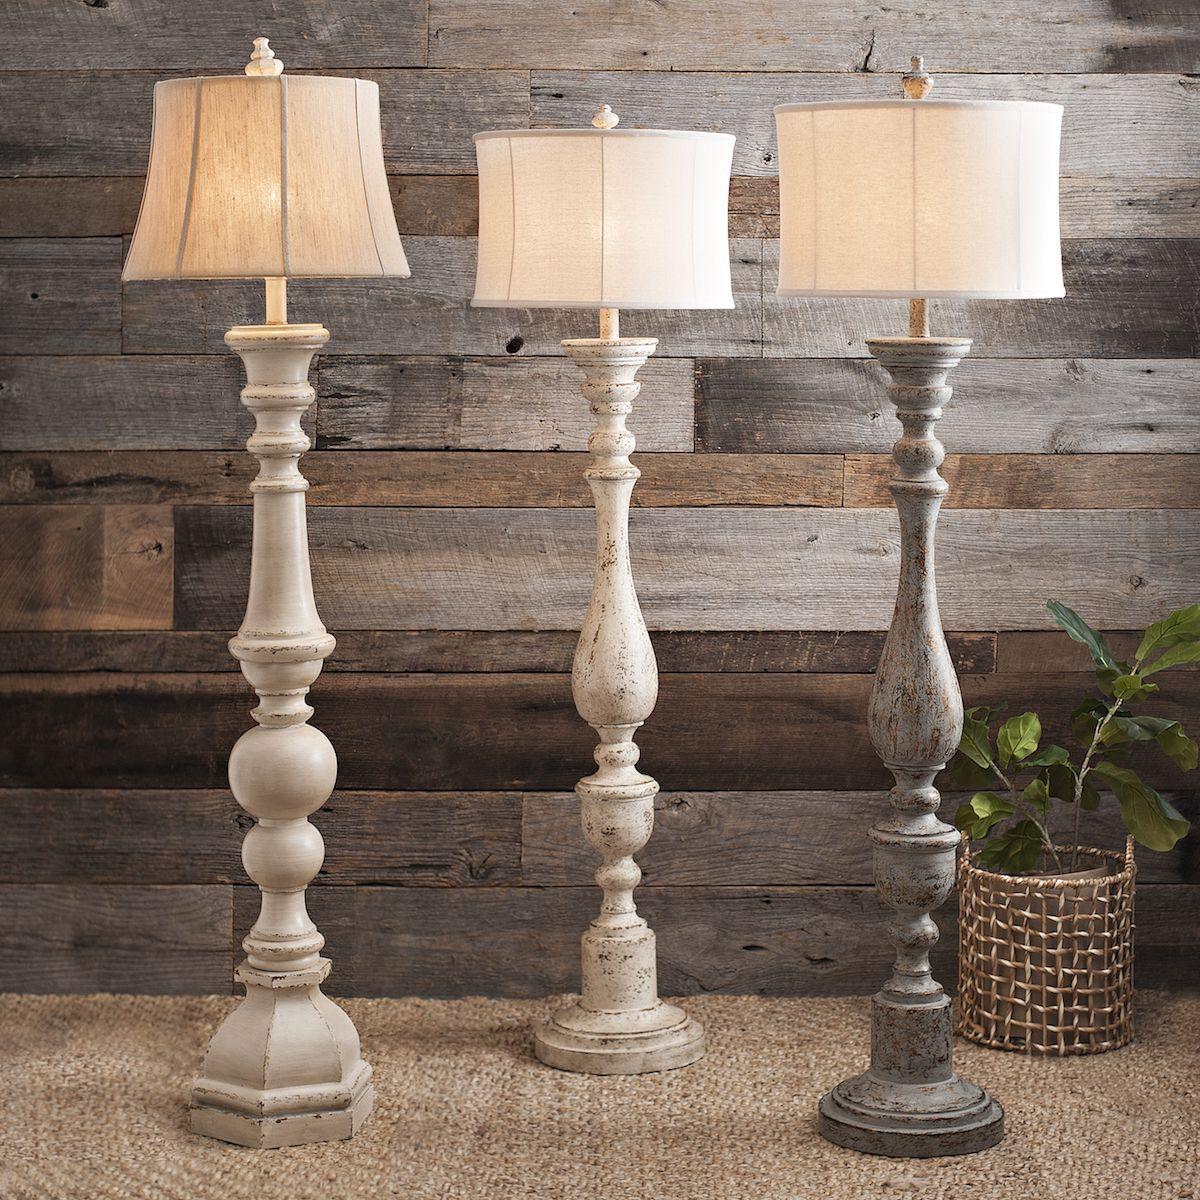 Distressed Cream Spindle Floor Lamp Farmhouse Floor Lamps Diy